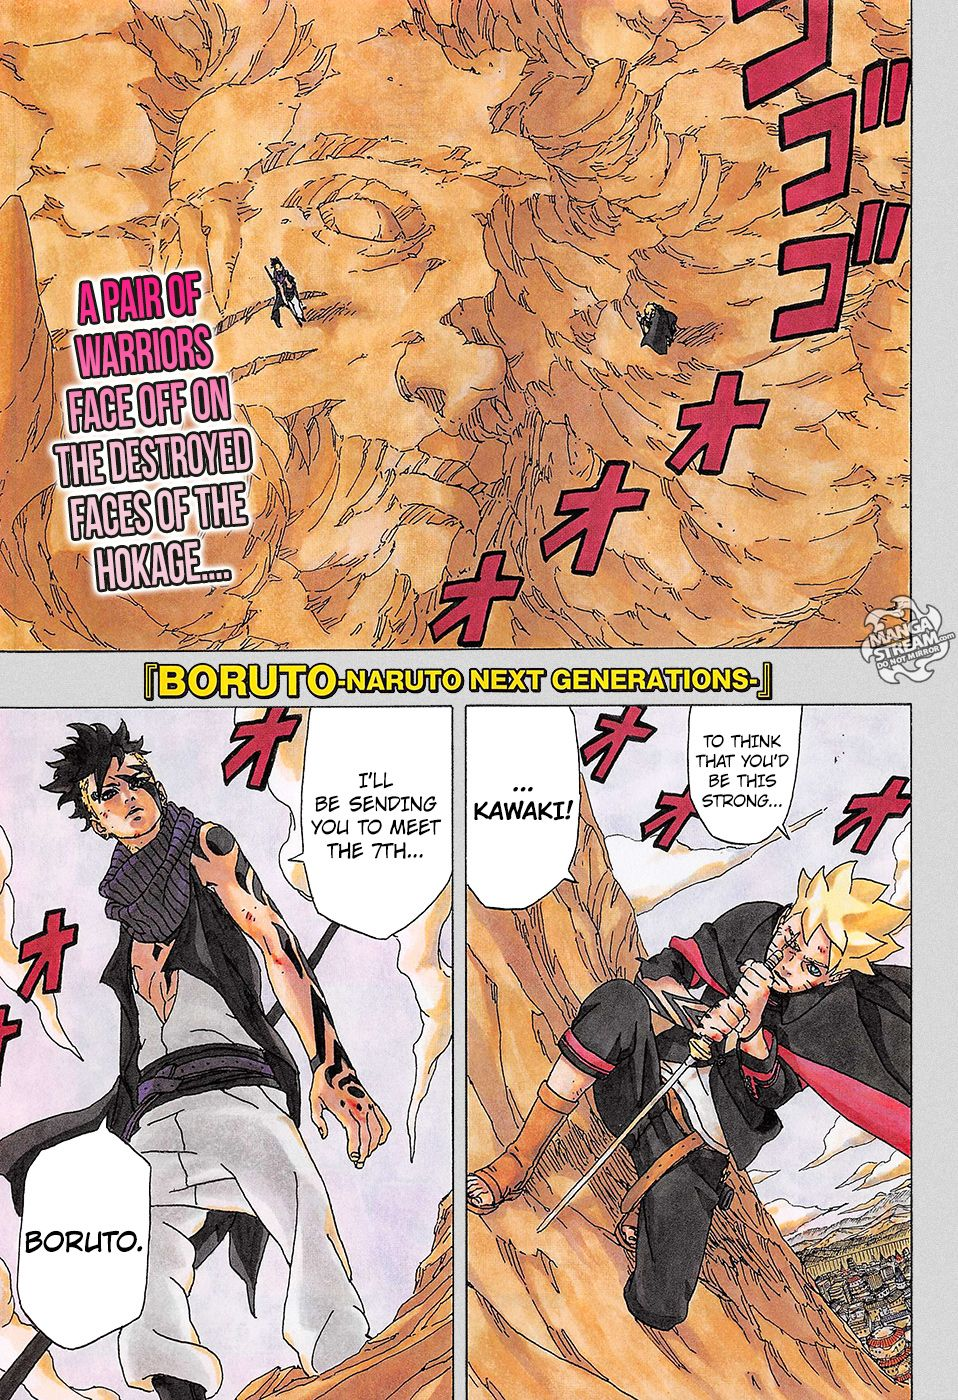 Read manga Boruto Naruto Next Generations 001 Uzumaki